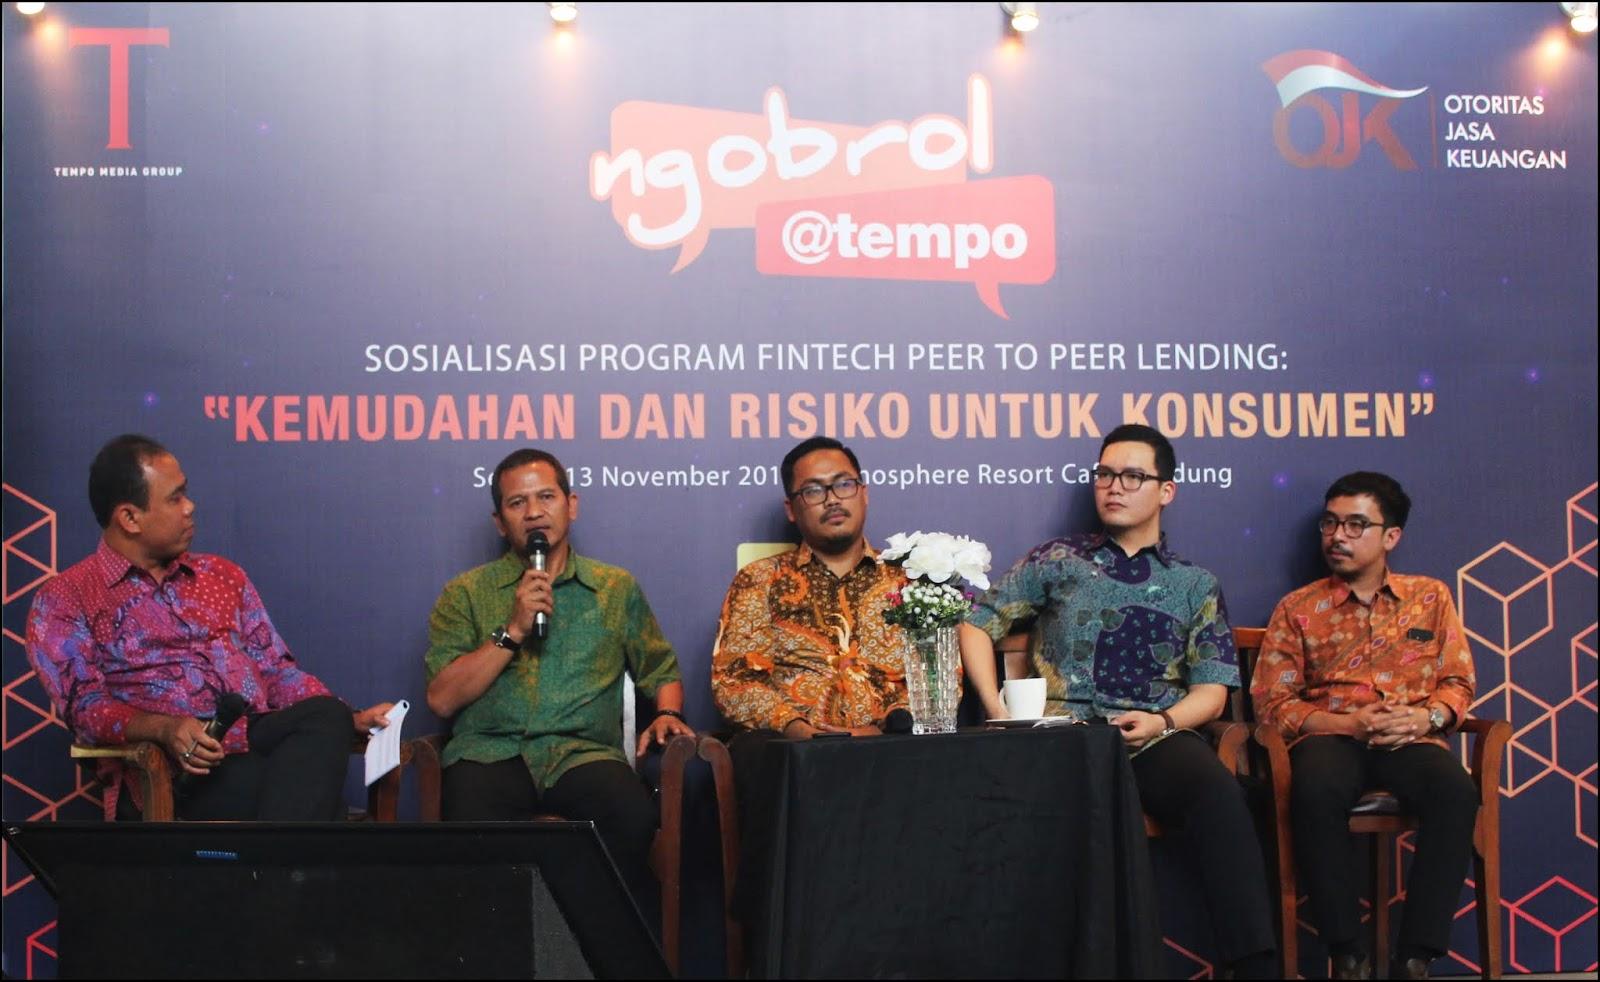 Fintech Peer to Peer Lending, Layanan Peminjaman Dana Alternatif Untuk Modal Usaha